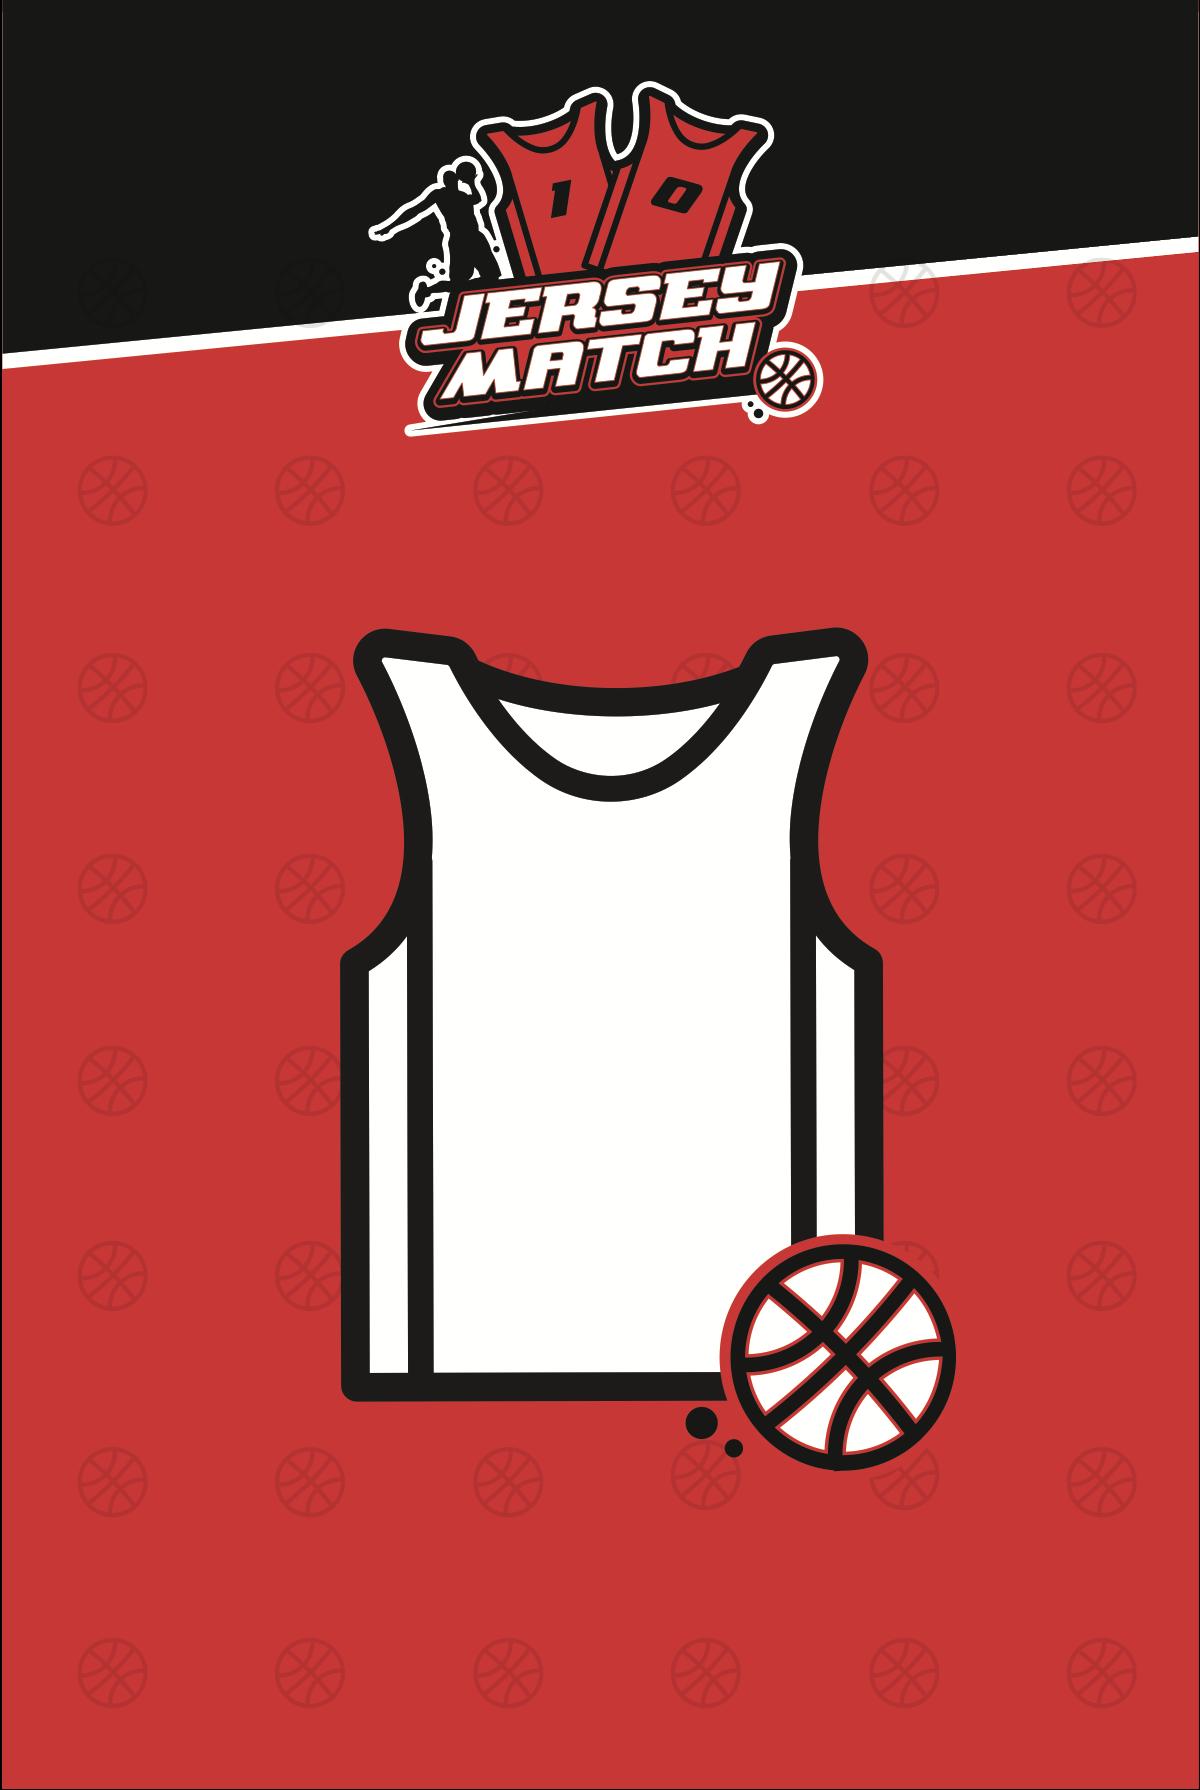 Kickstarter collection items for Jersey Match